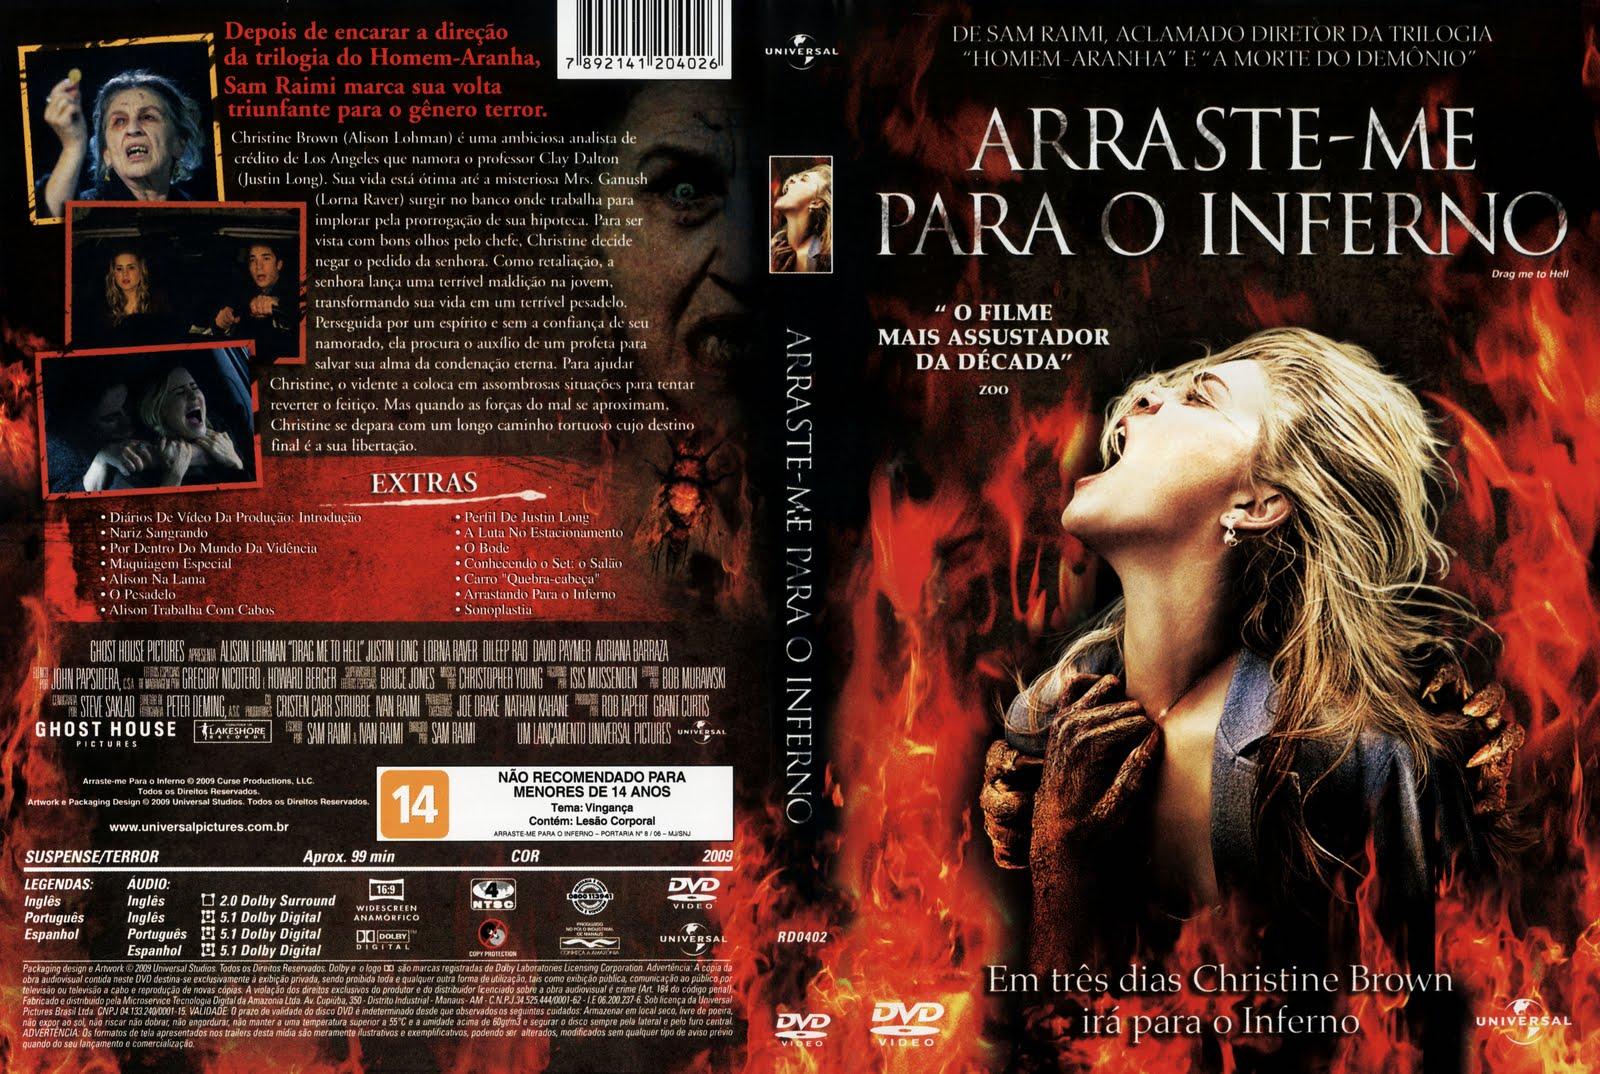 Arraste-me Para o Inferno DVD Capa